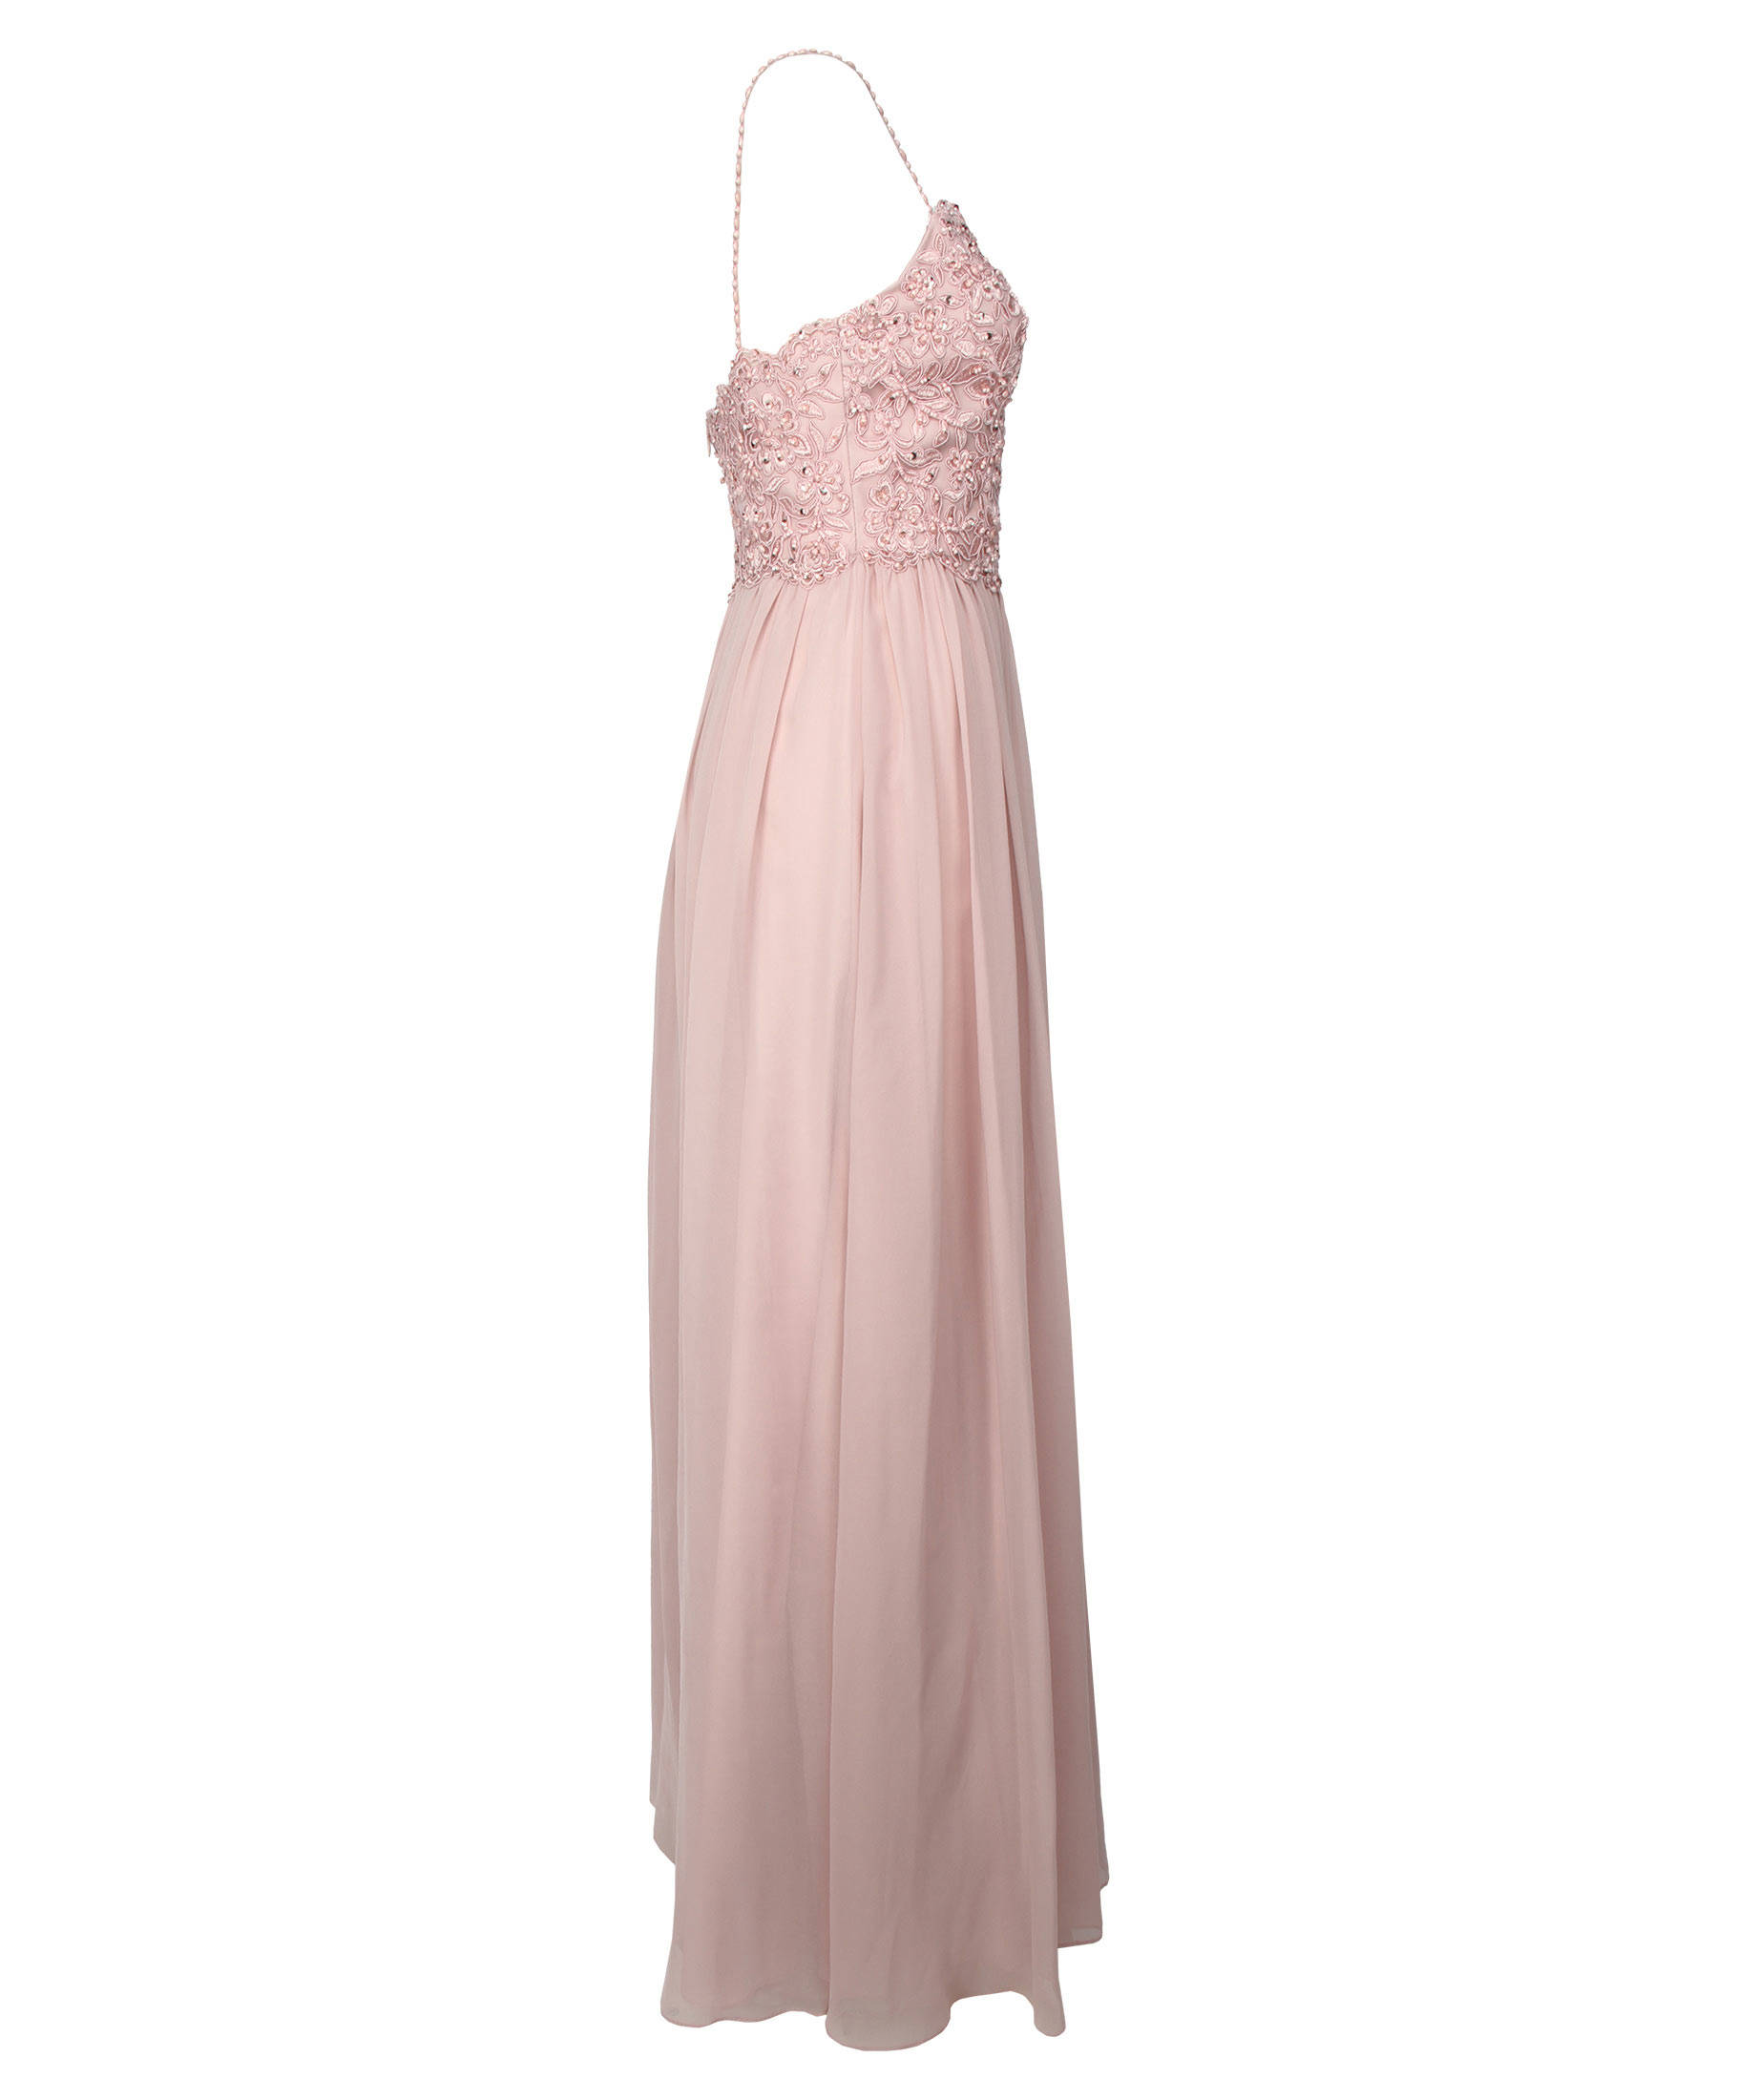 Laona Damen Abendkleid  engelhorn